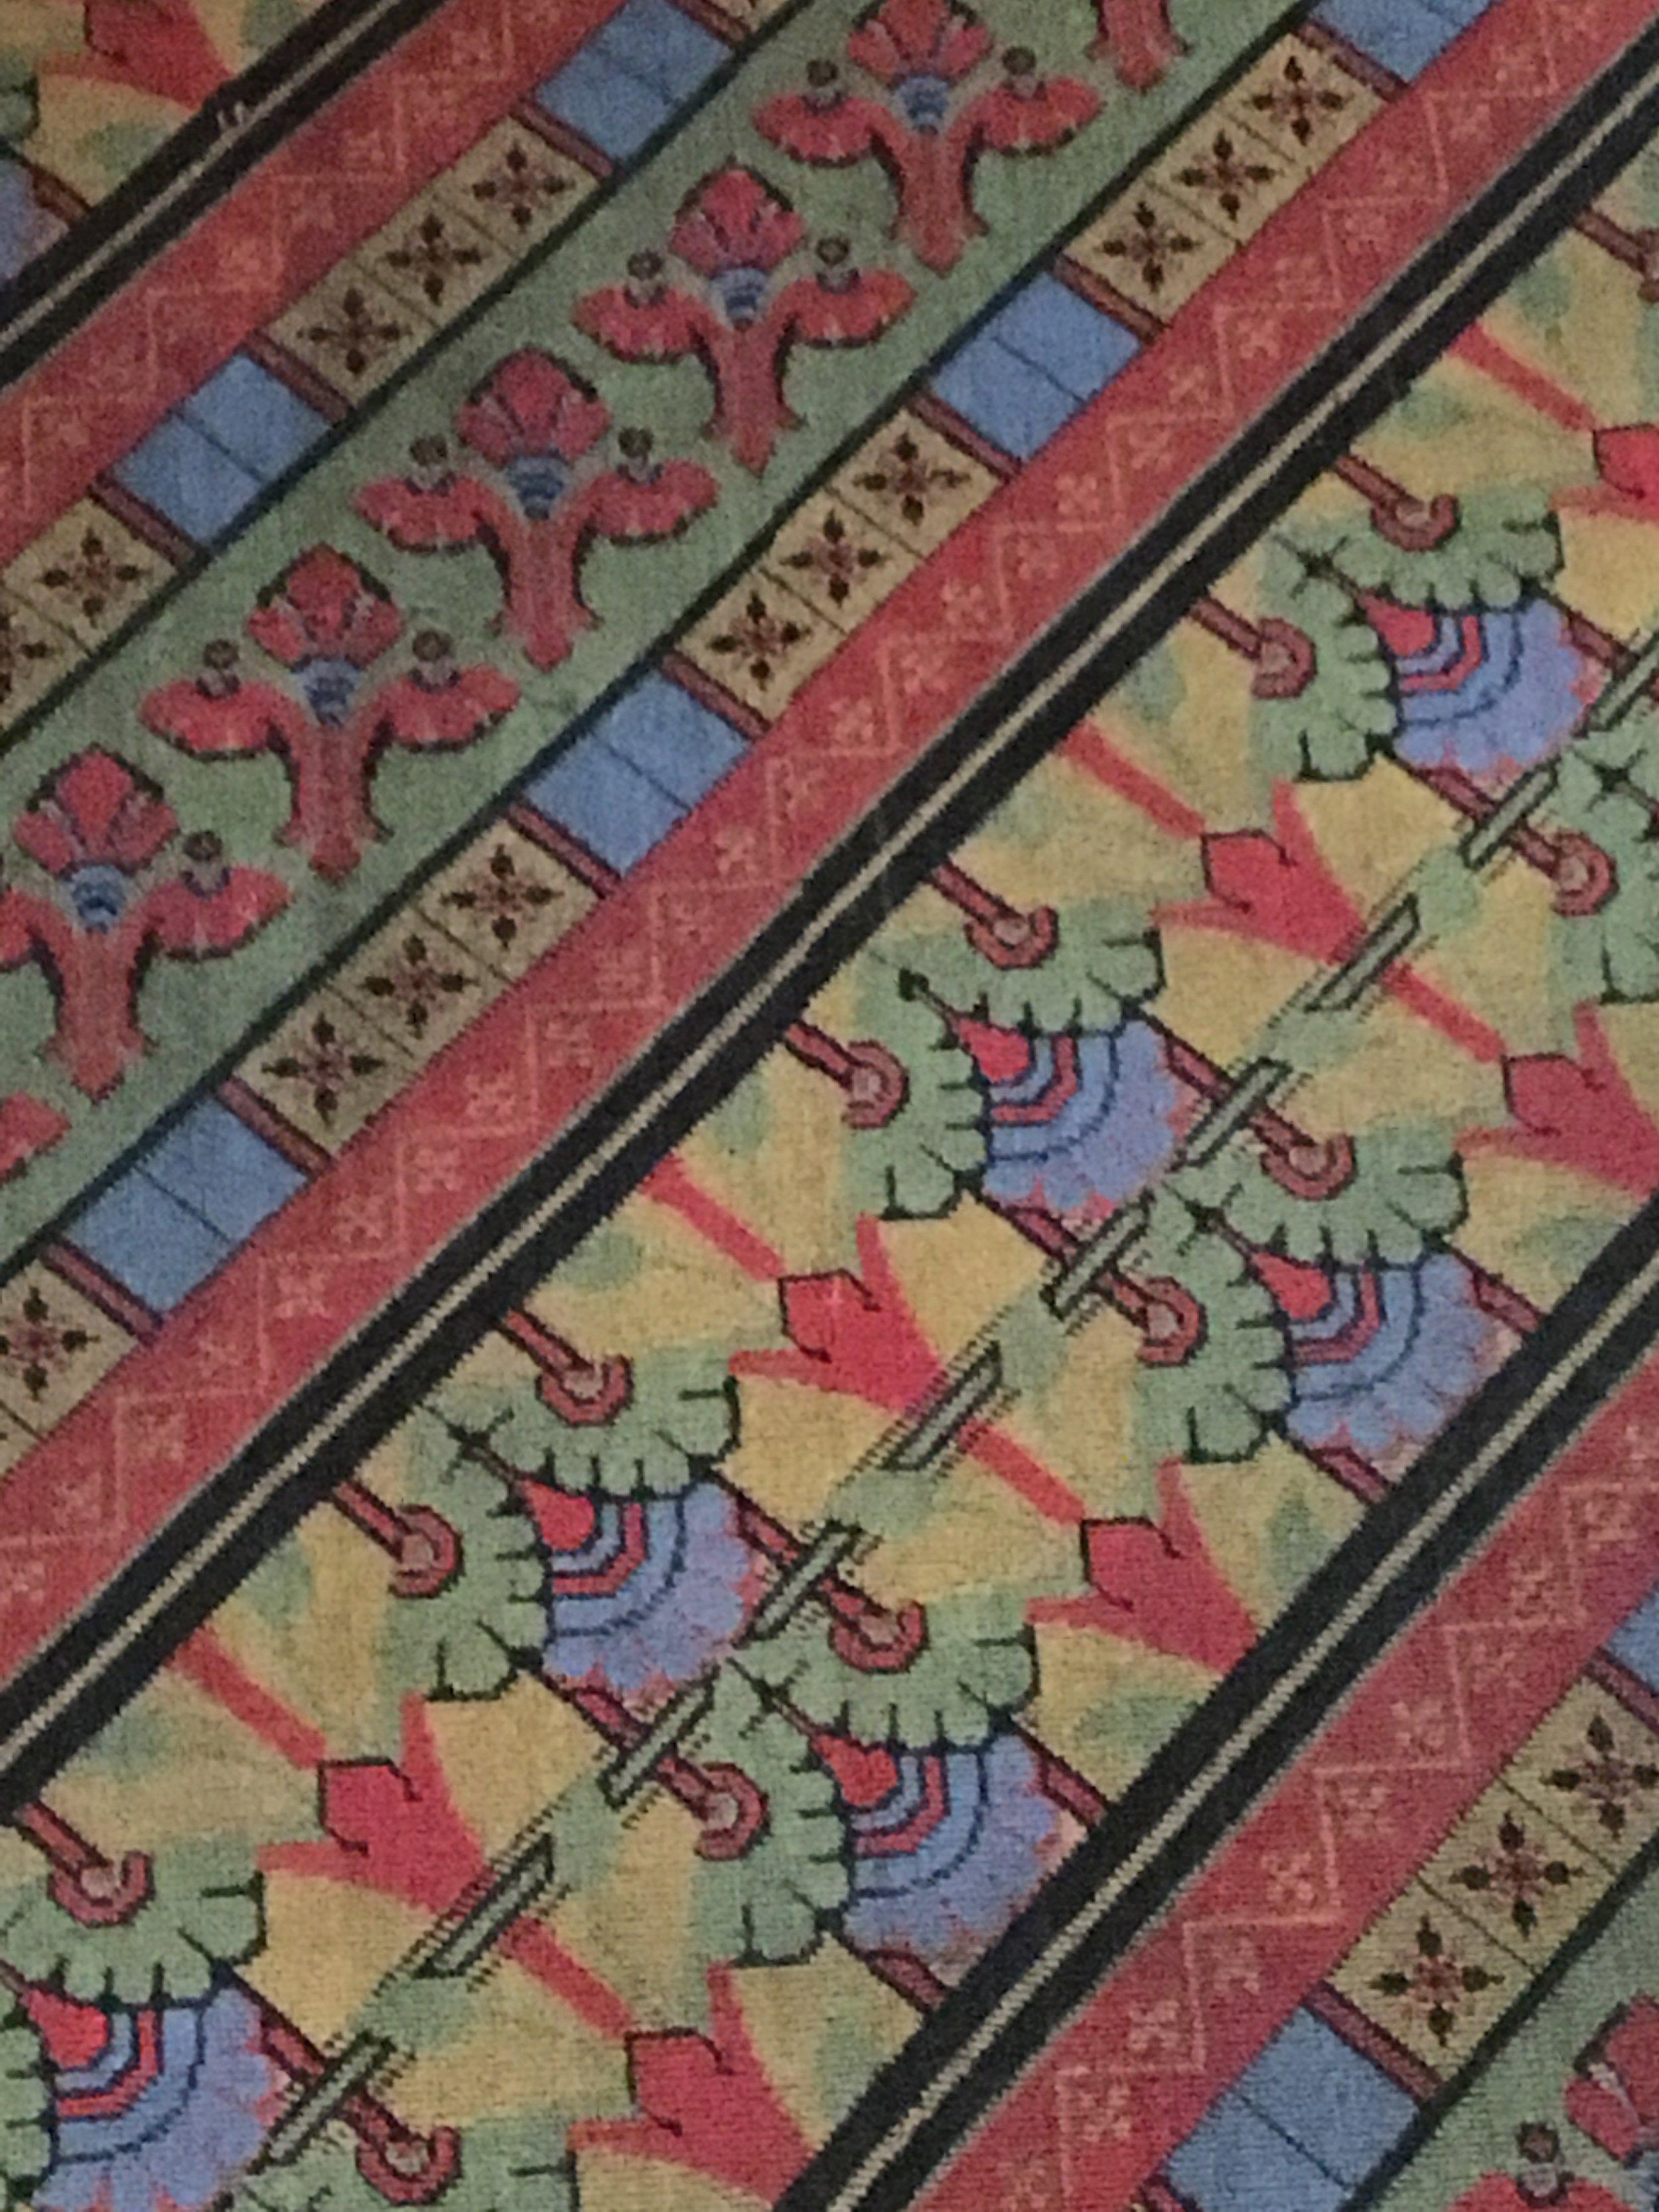 Original carpet